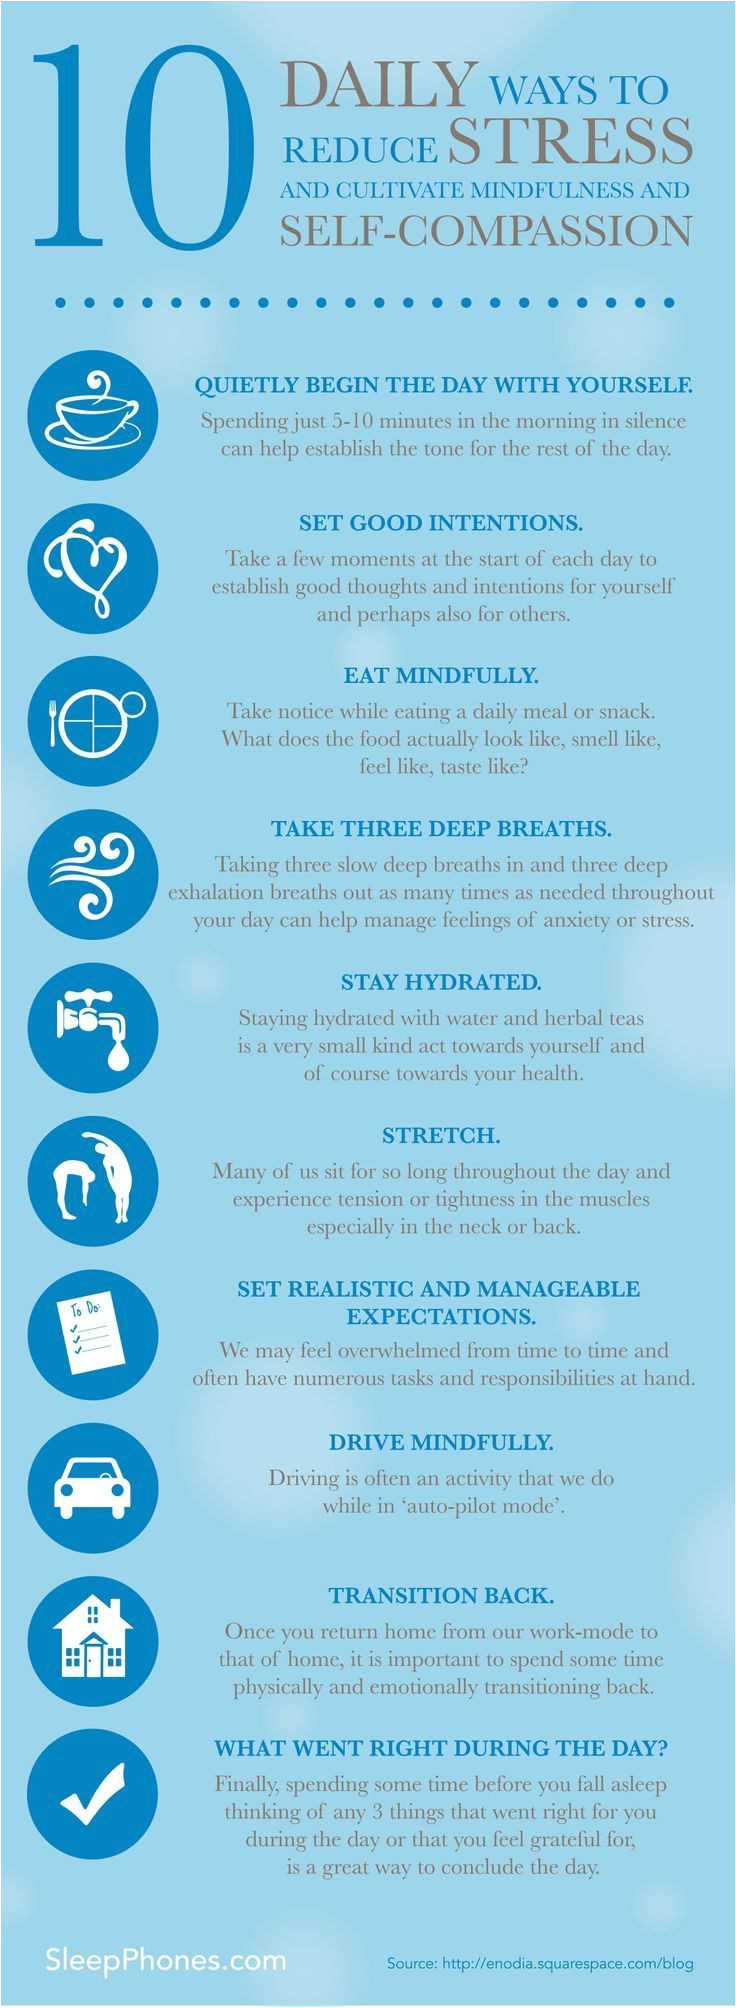 10 daily ways to reduce stress